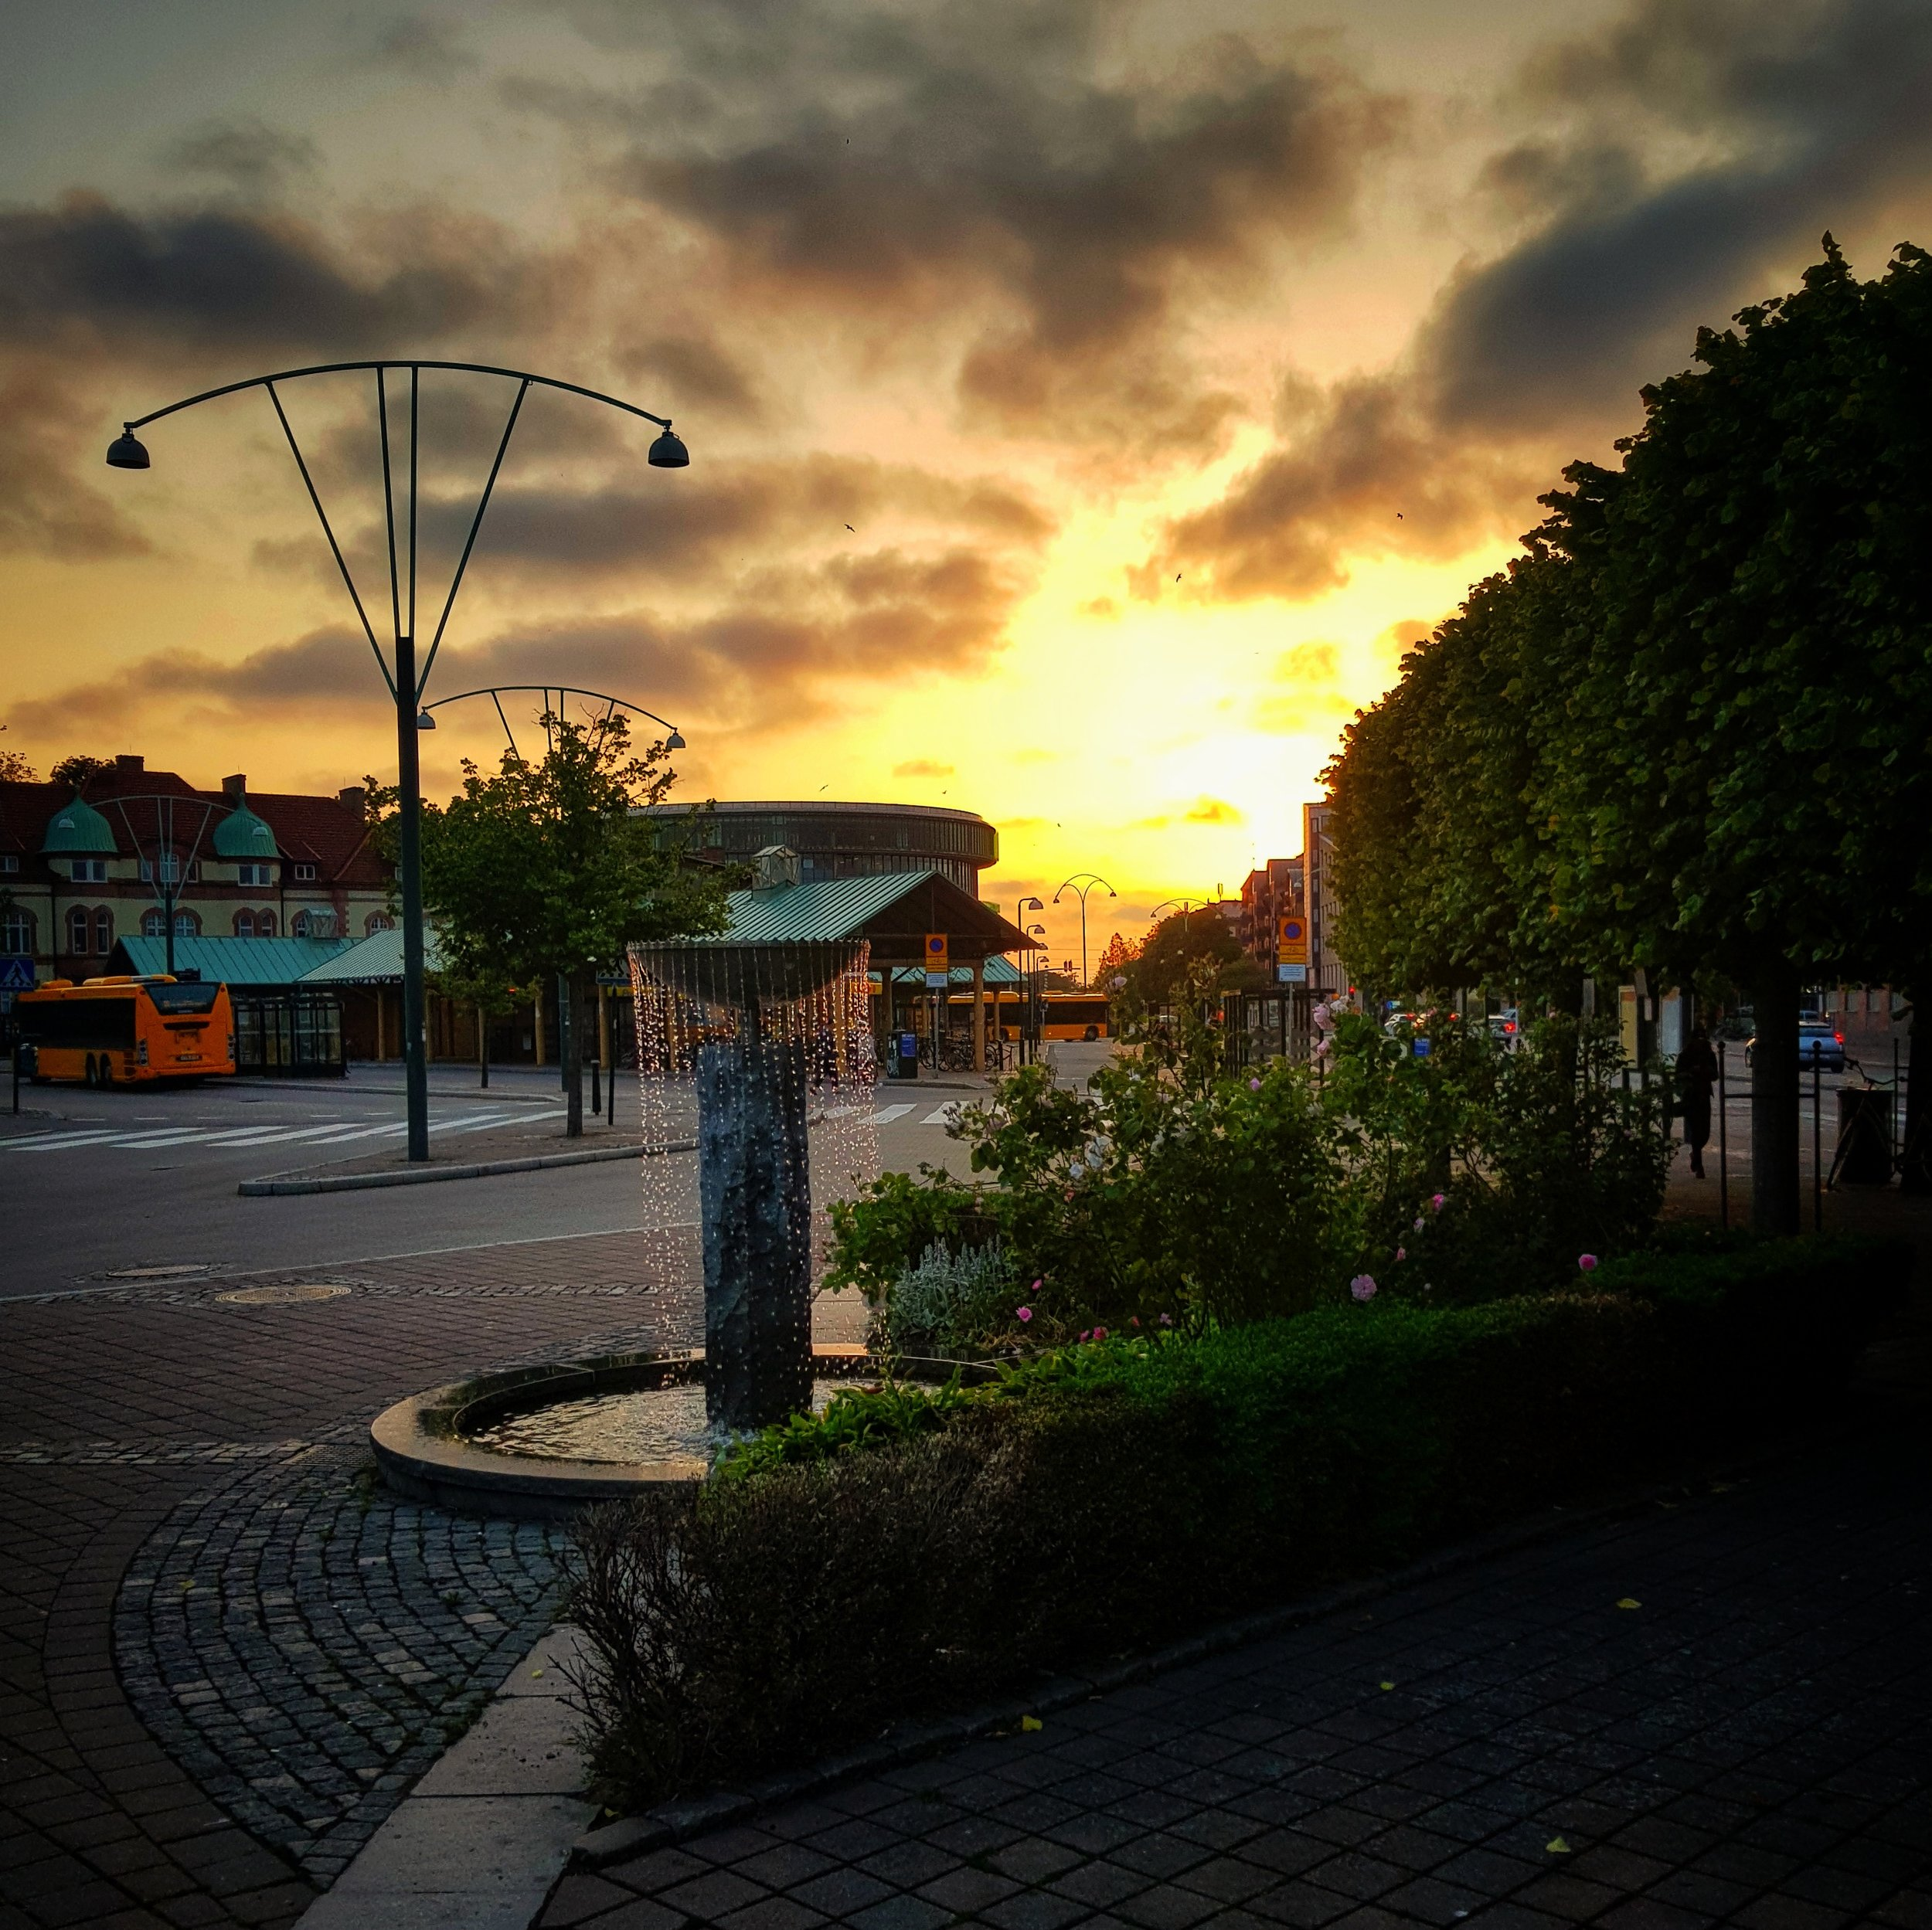 Day 166 - June 15: Technicolor Sunset